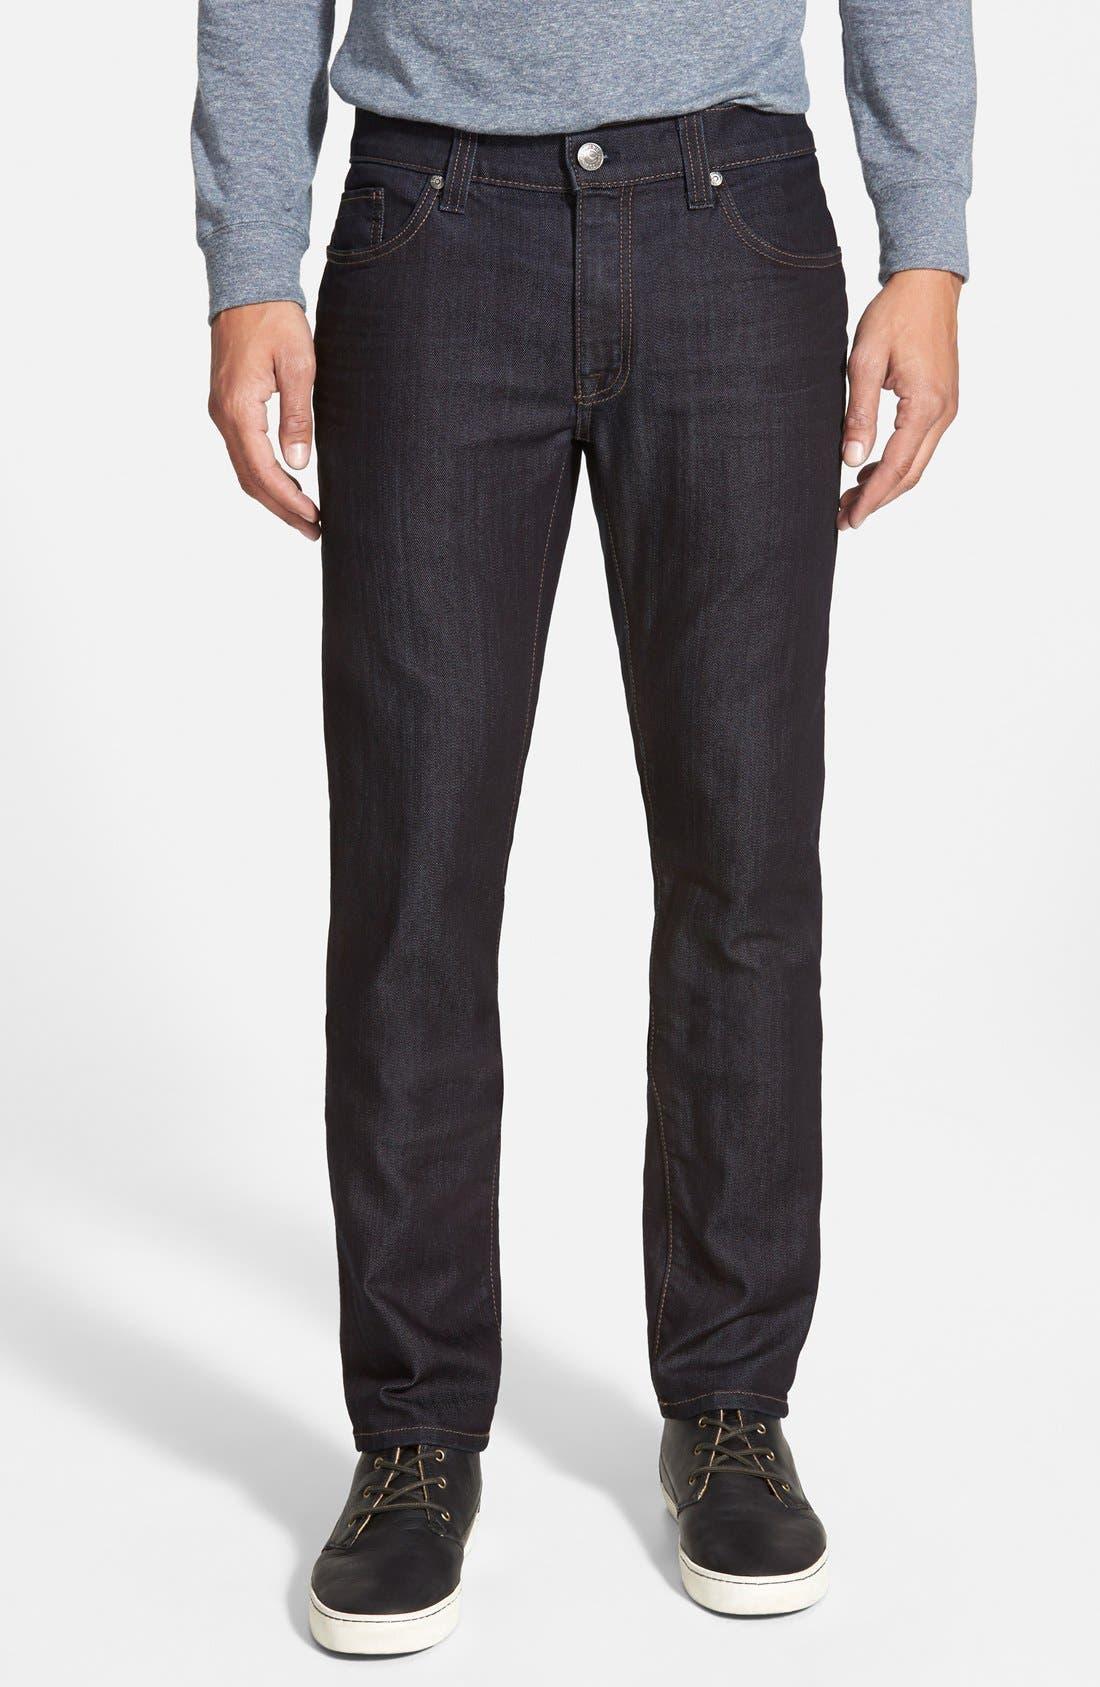 Main Image - Fidelity Denim Torino Slim Fit Jeans (Revolution Rinse)